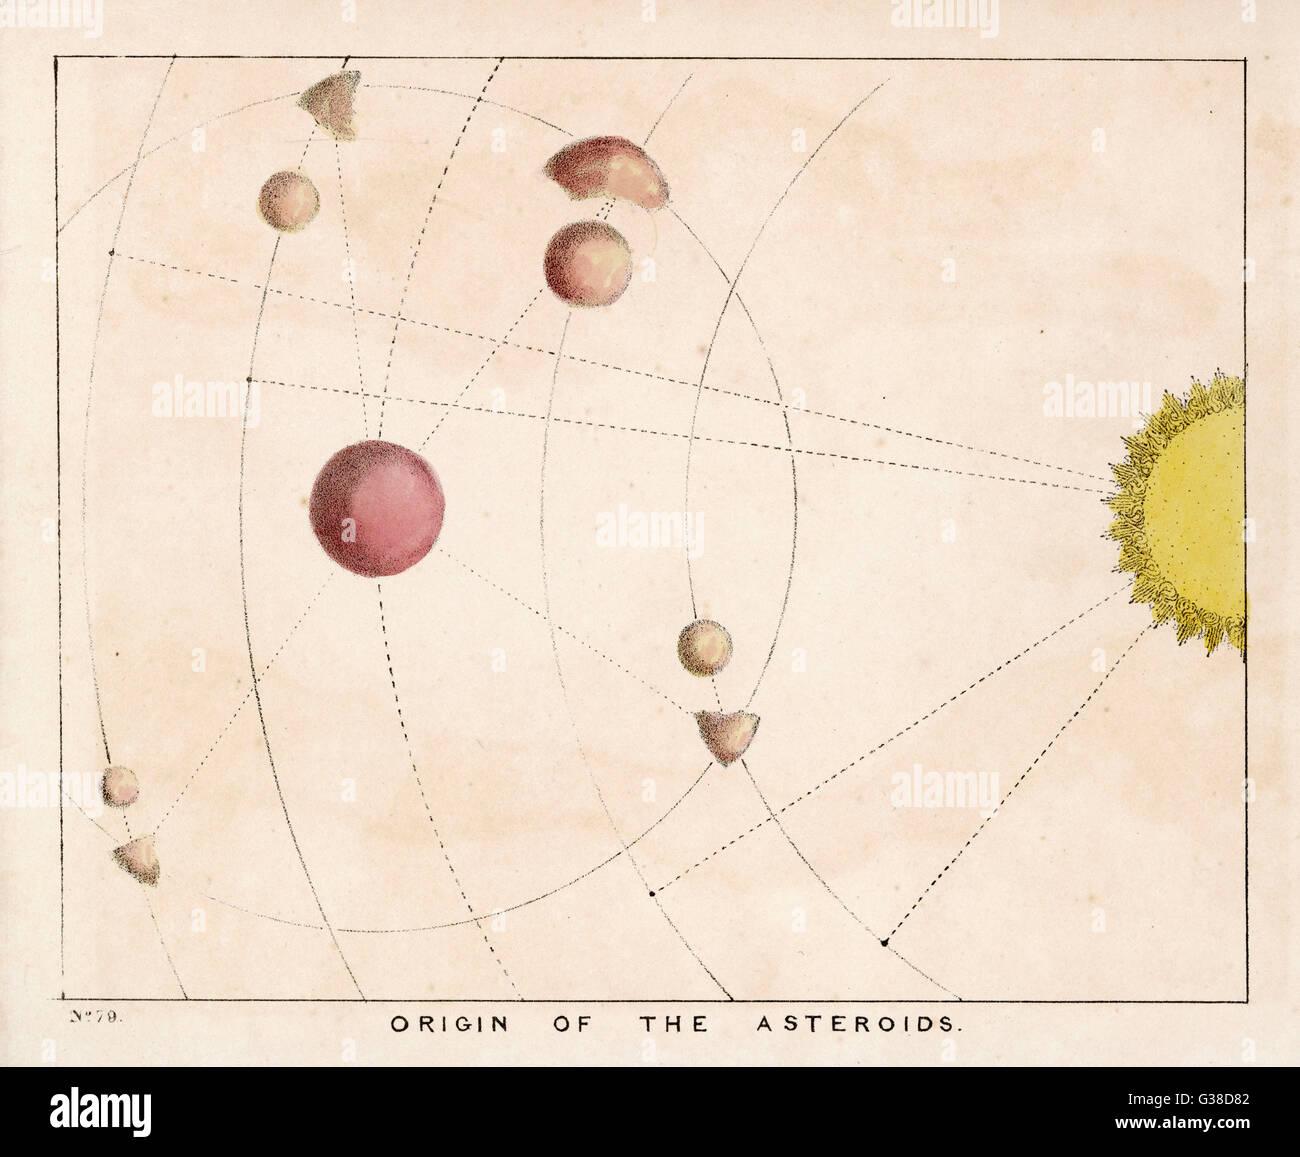 The origin of asteroids         Date: 1849 - Stock Image